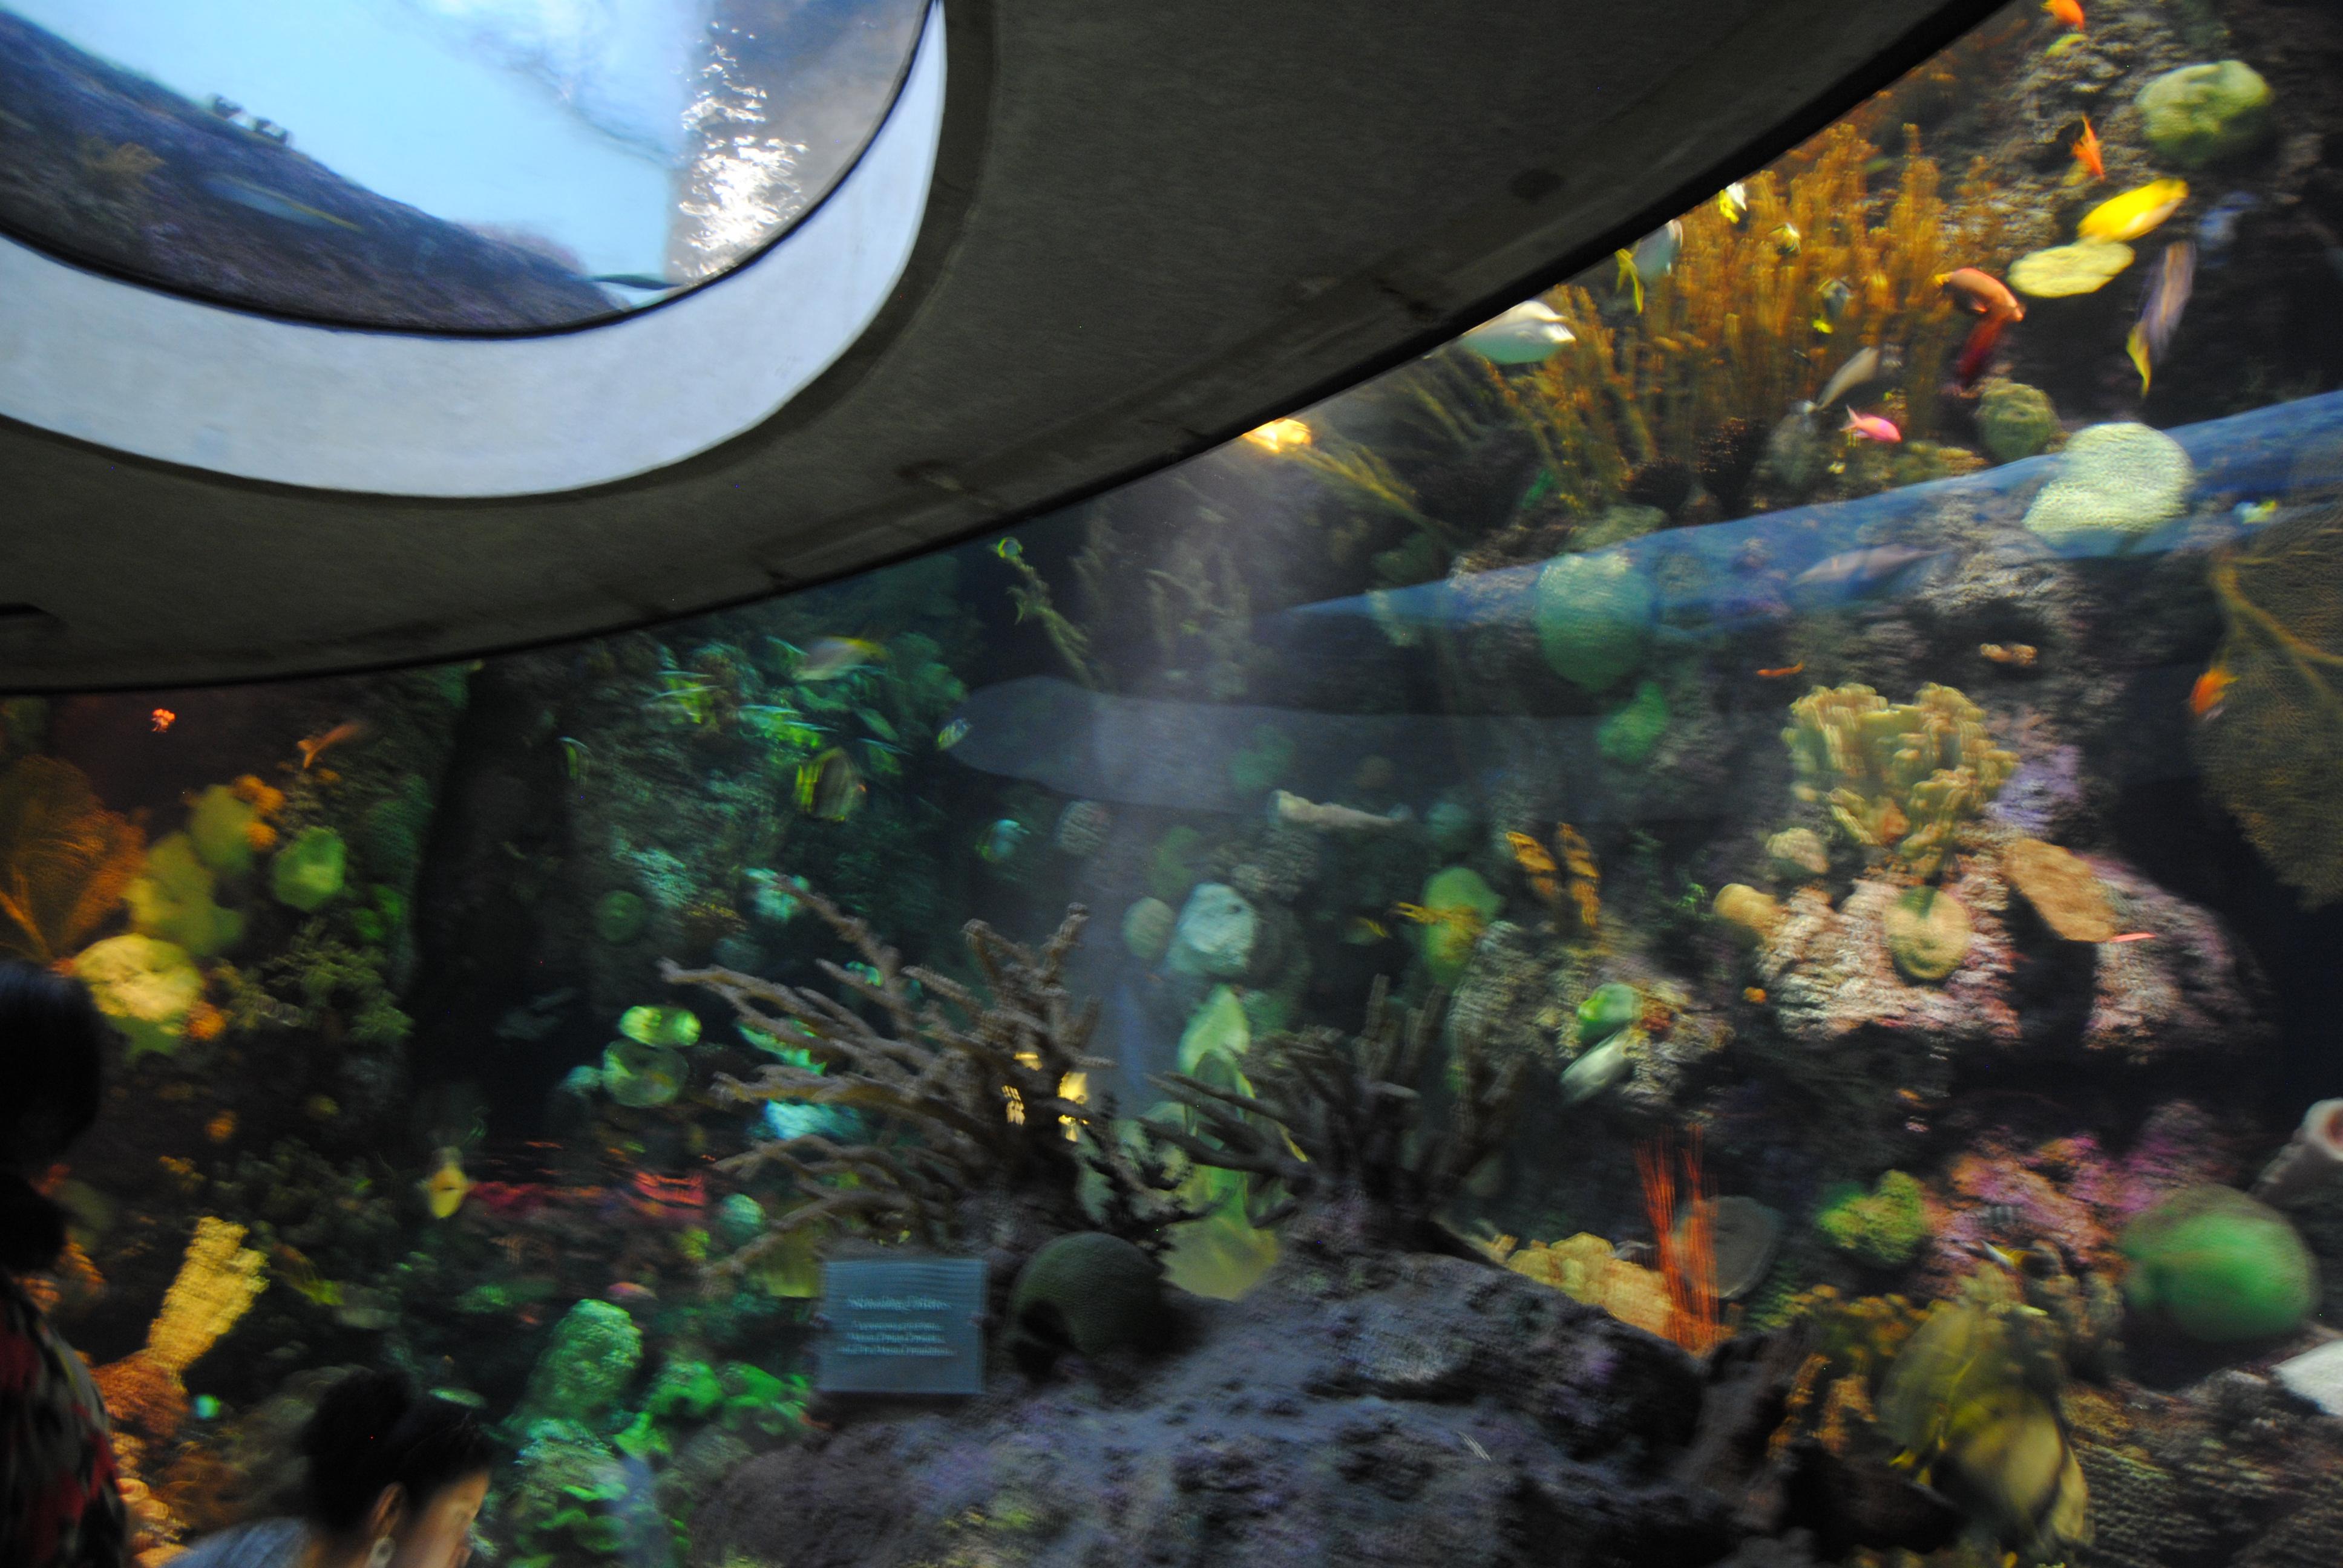 Shedd Aquarium School Tours